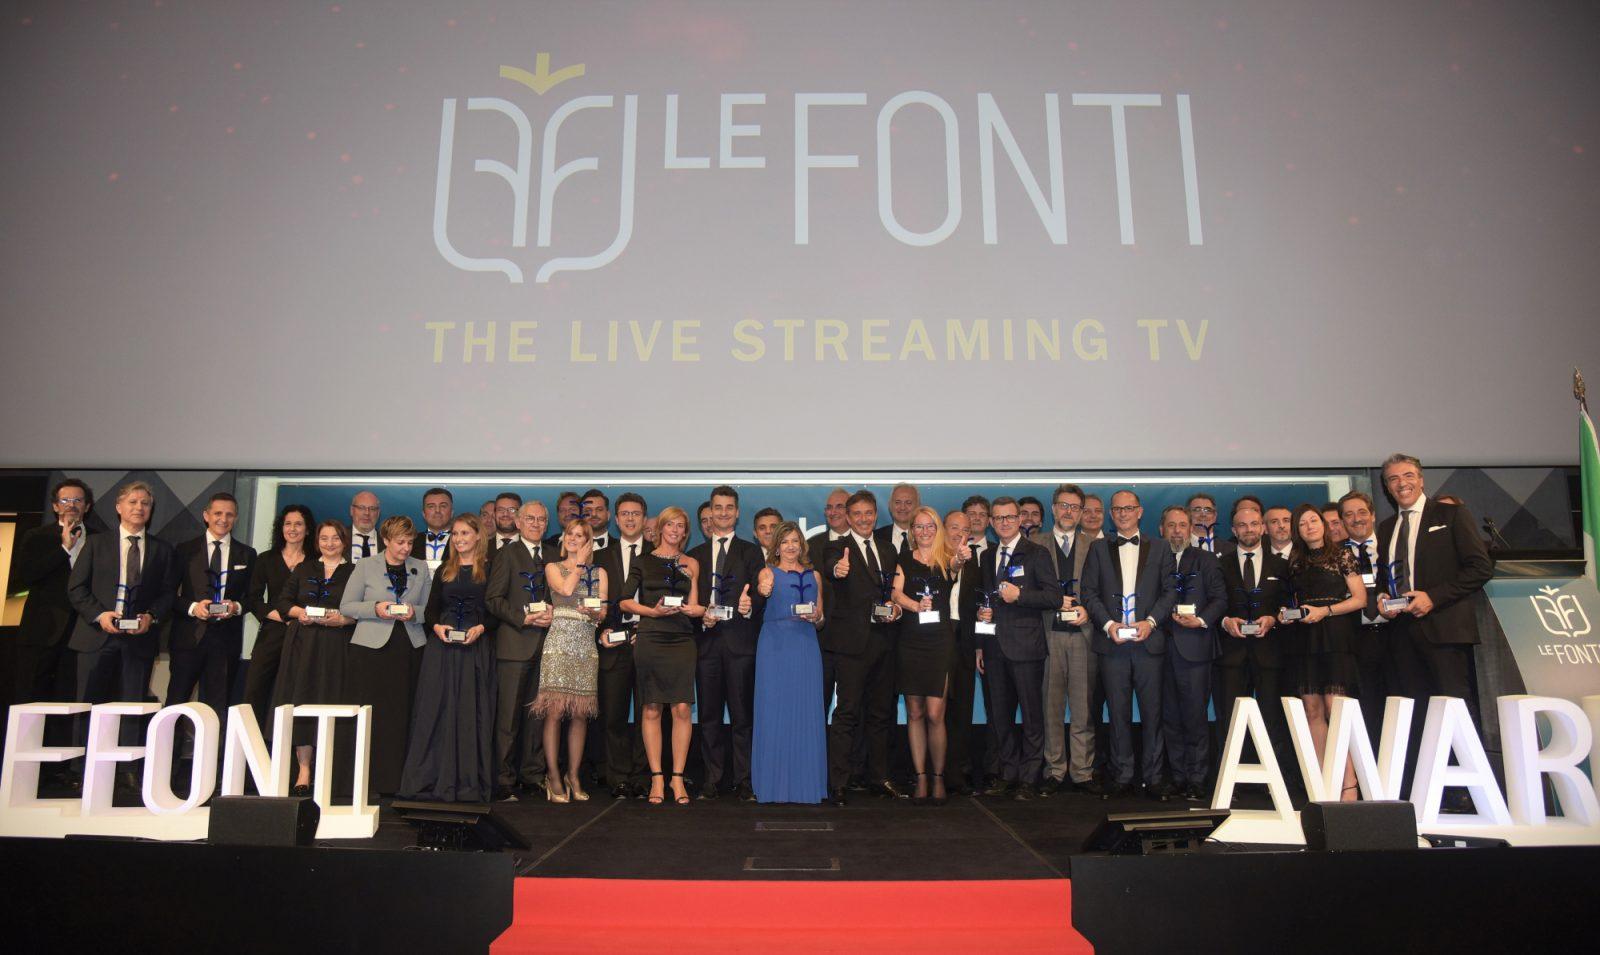 Le Fonti Awards 2019 - I vincitori Imc